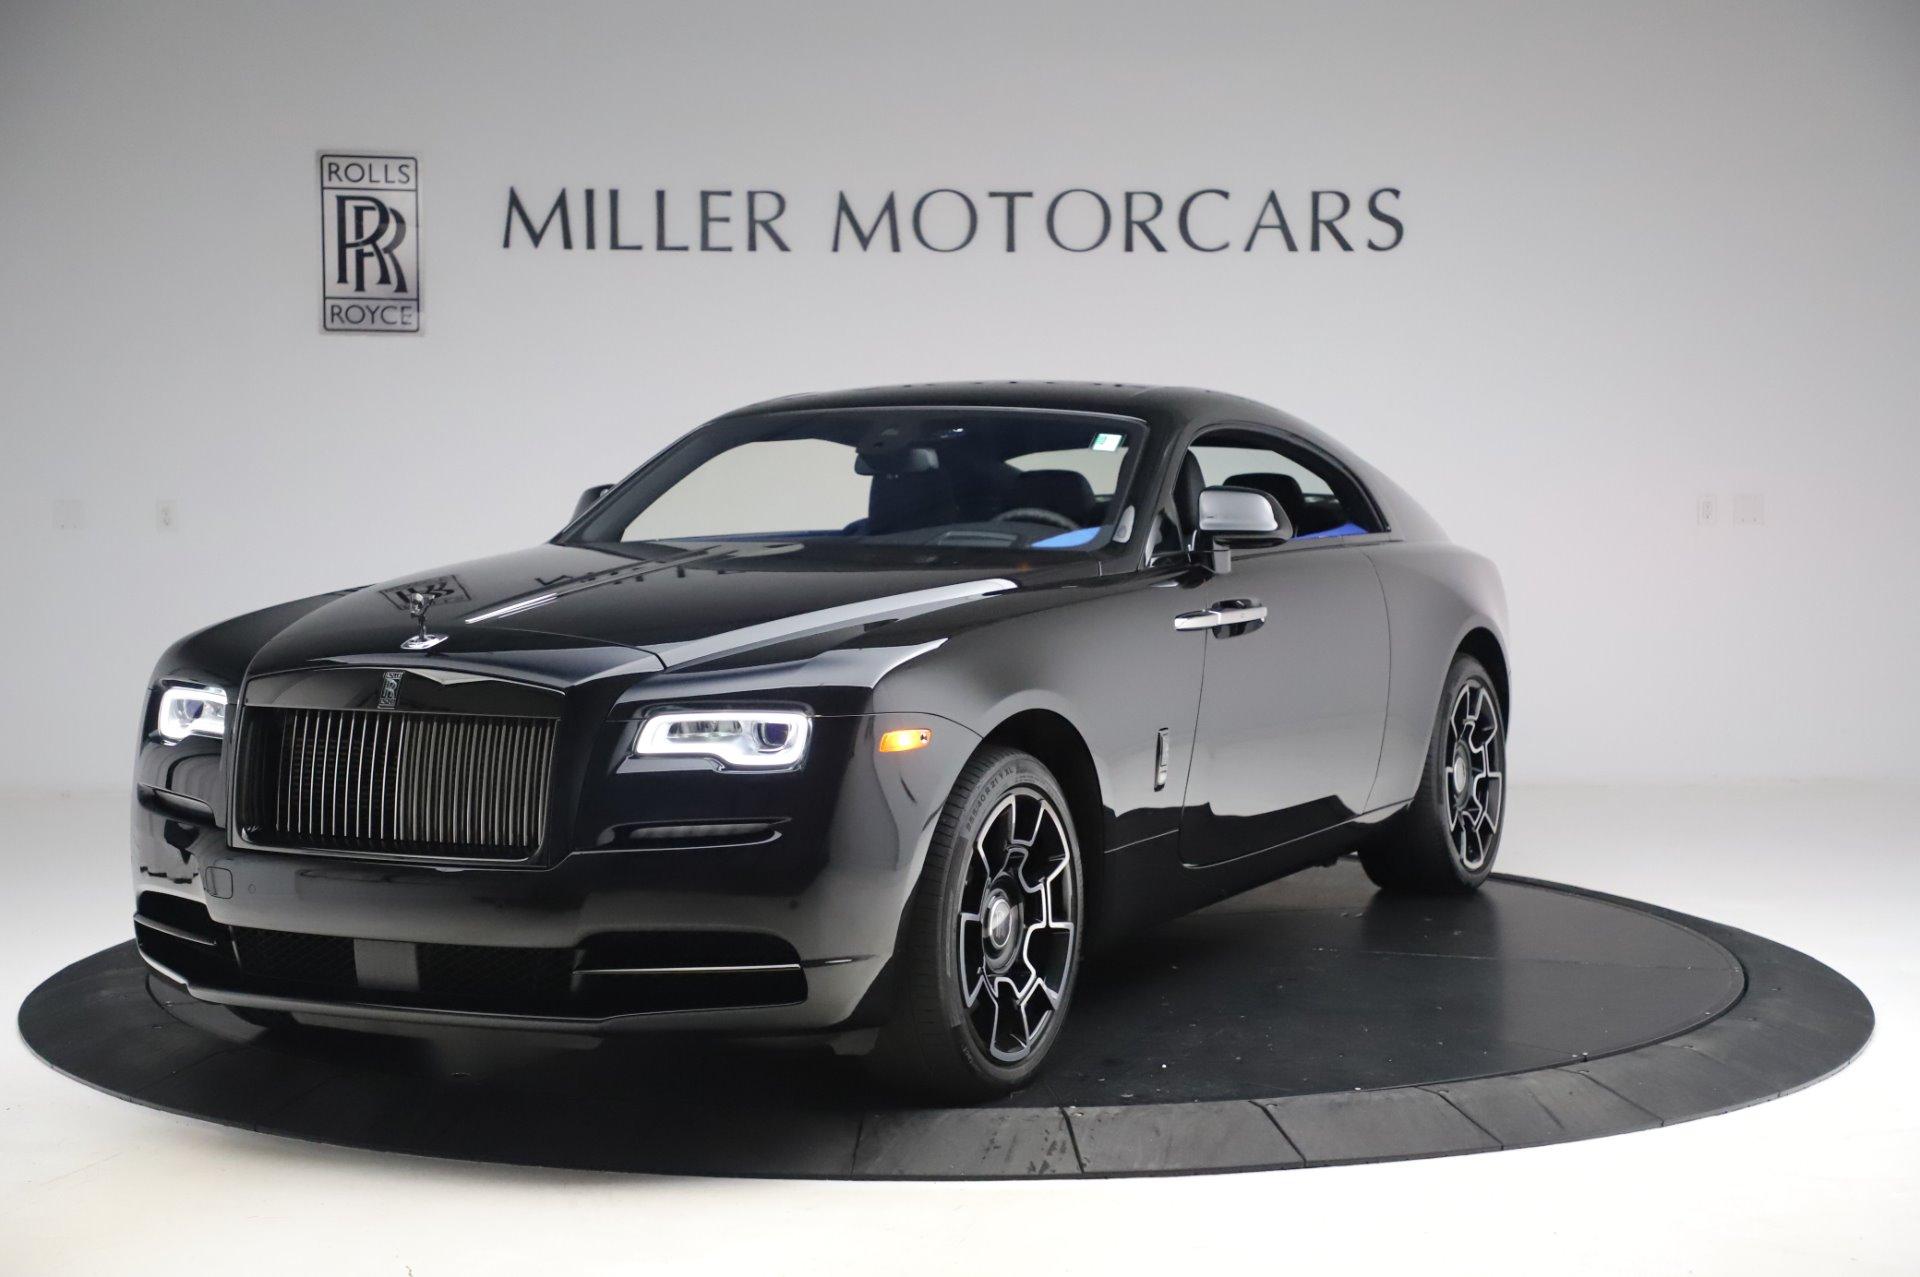 New 2017 Rolls-Royce Wraith Black Badge for sale Sold at Alfa Romeo of Westport in Westport CT 06880 1